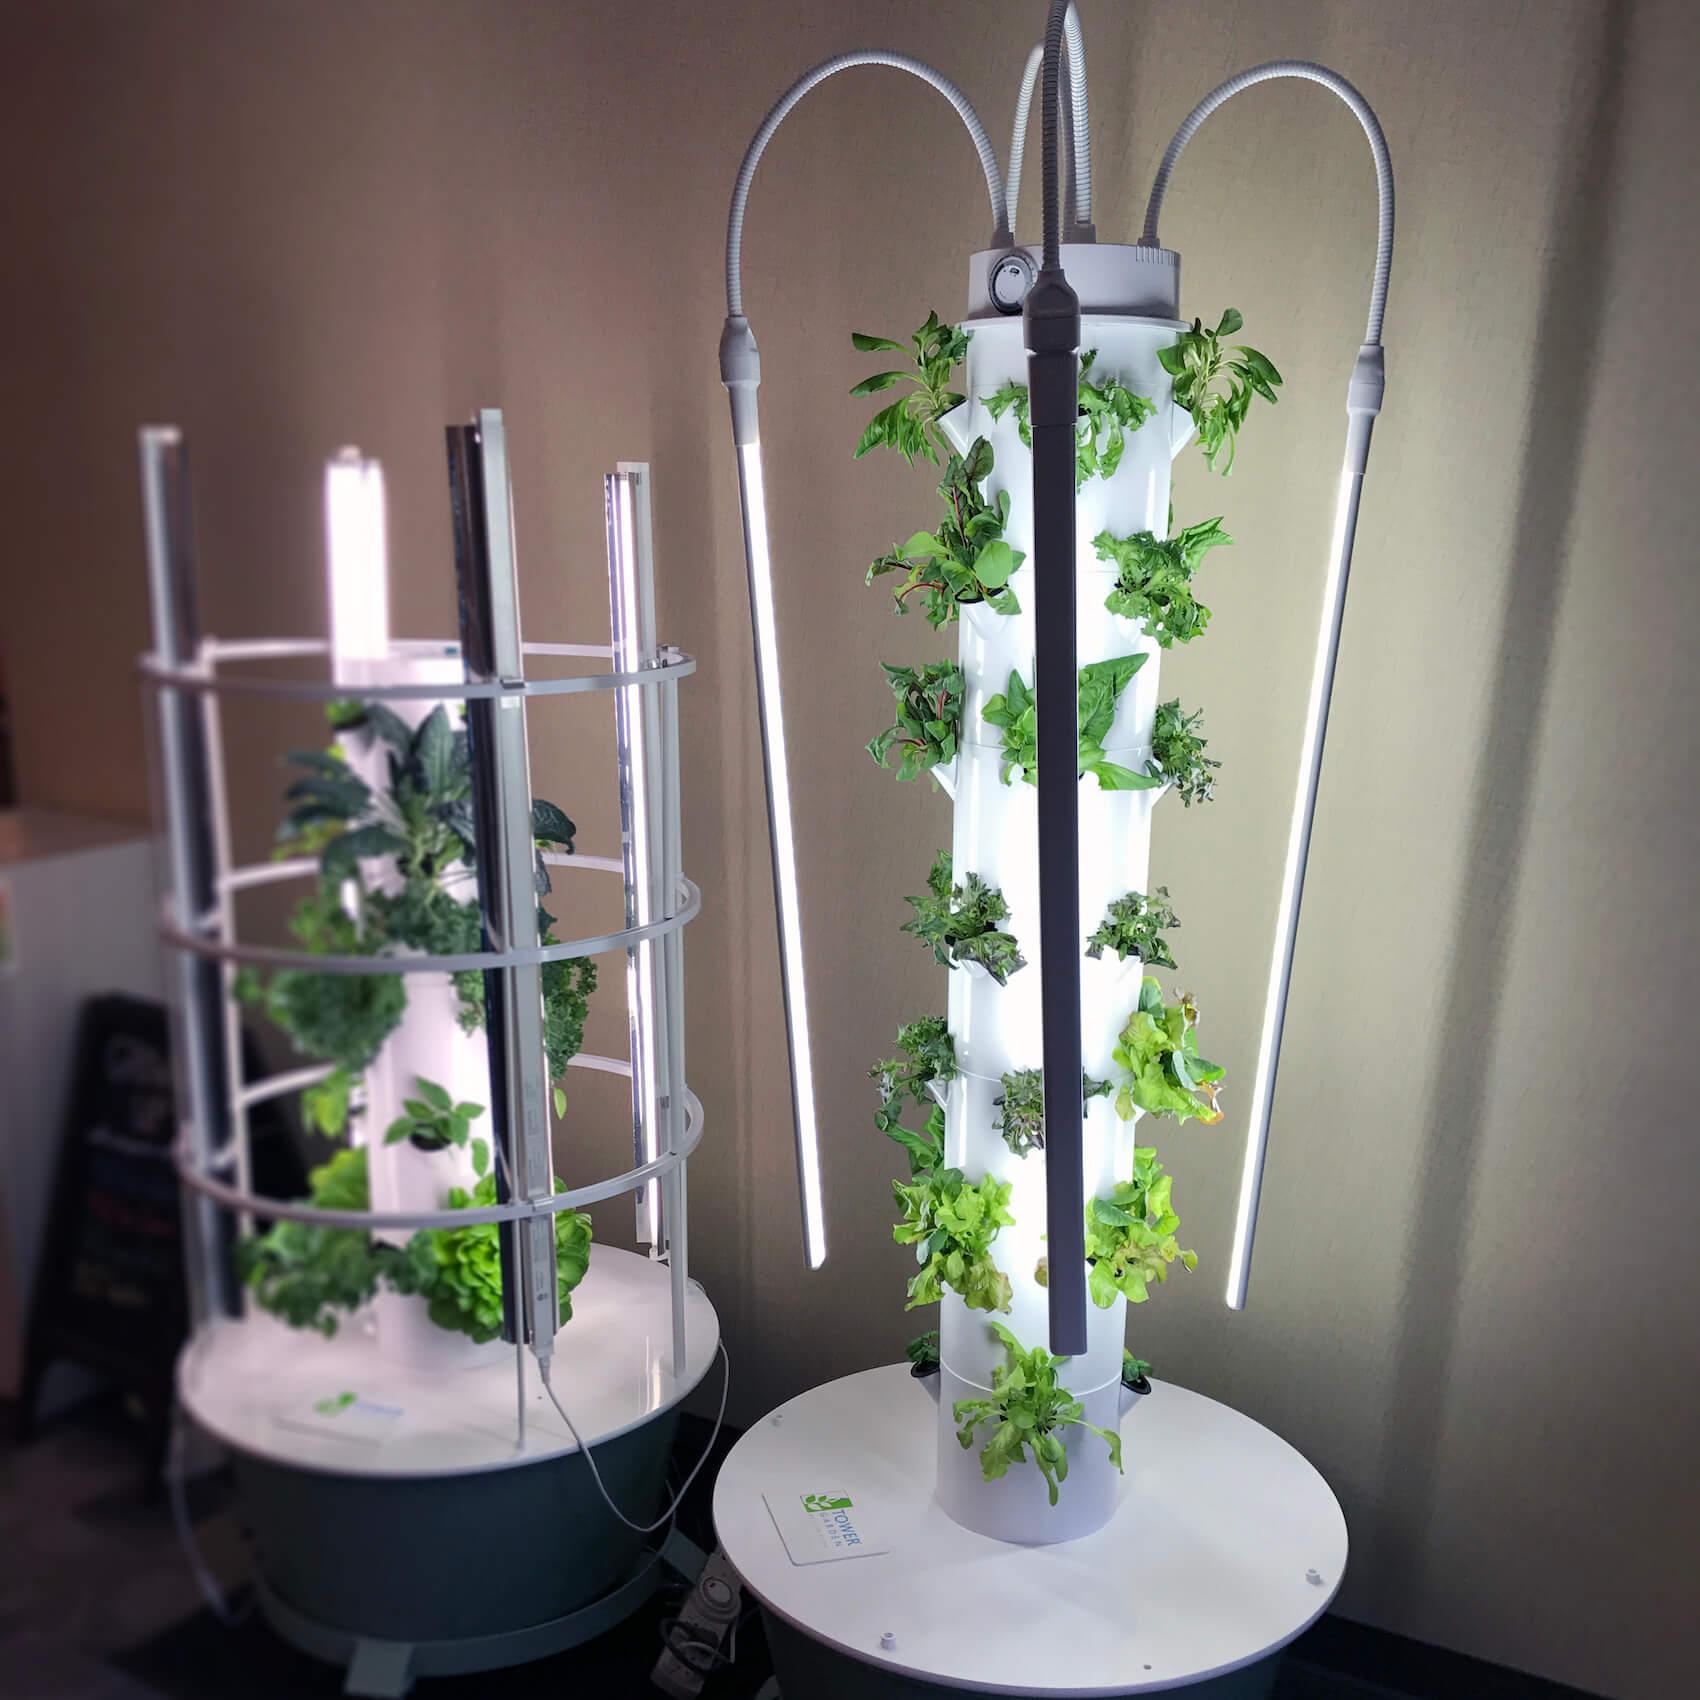 Led Lights Make Indoor Vertical Gardening Easier Backyard Tower Garden